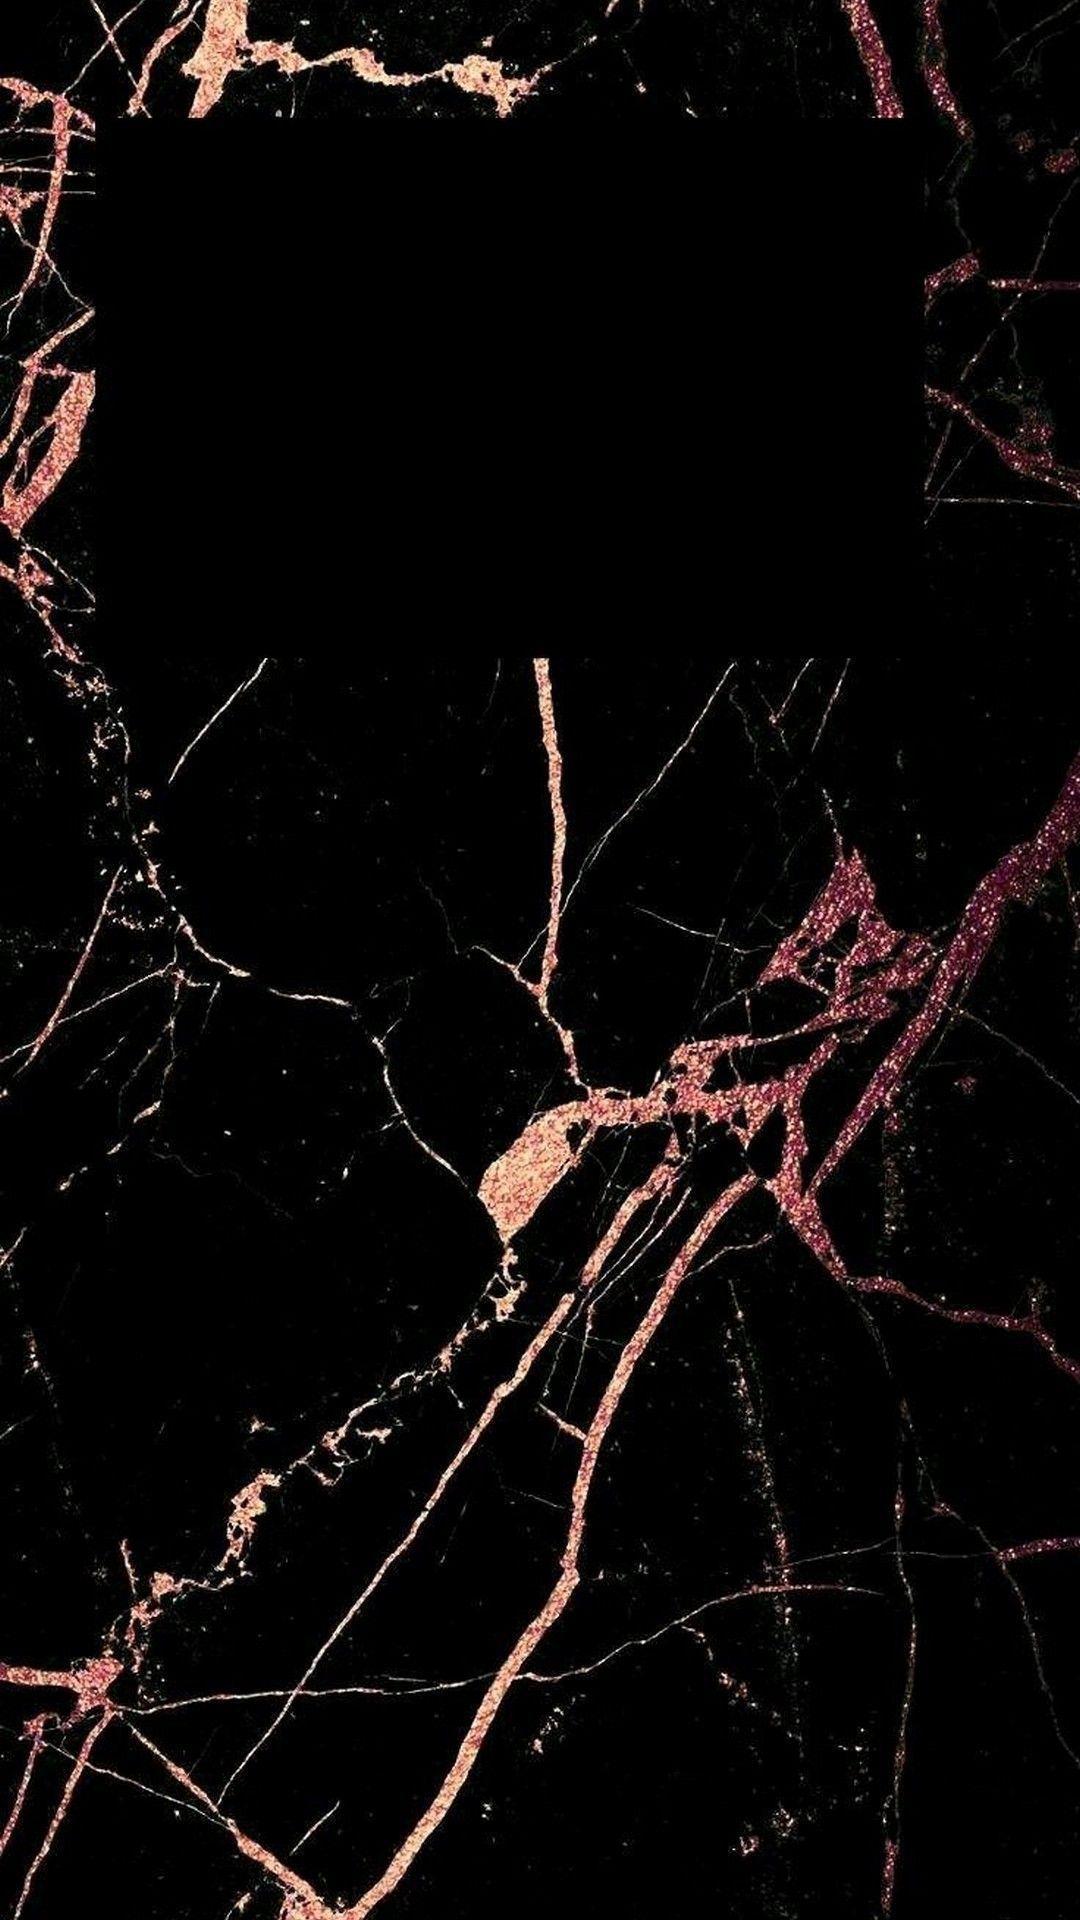 Gold Phone Lock Screen Wallpapers Top Free Gold Phone Lock Screen